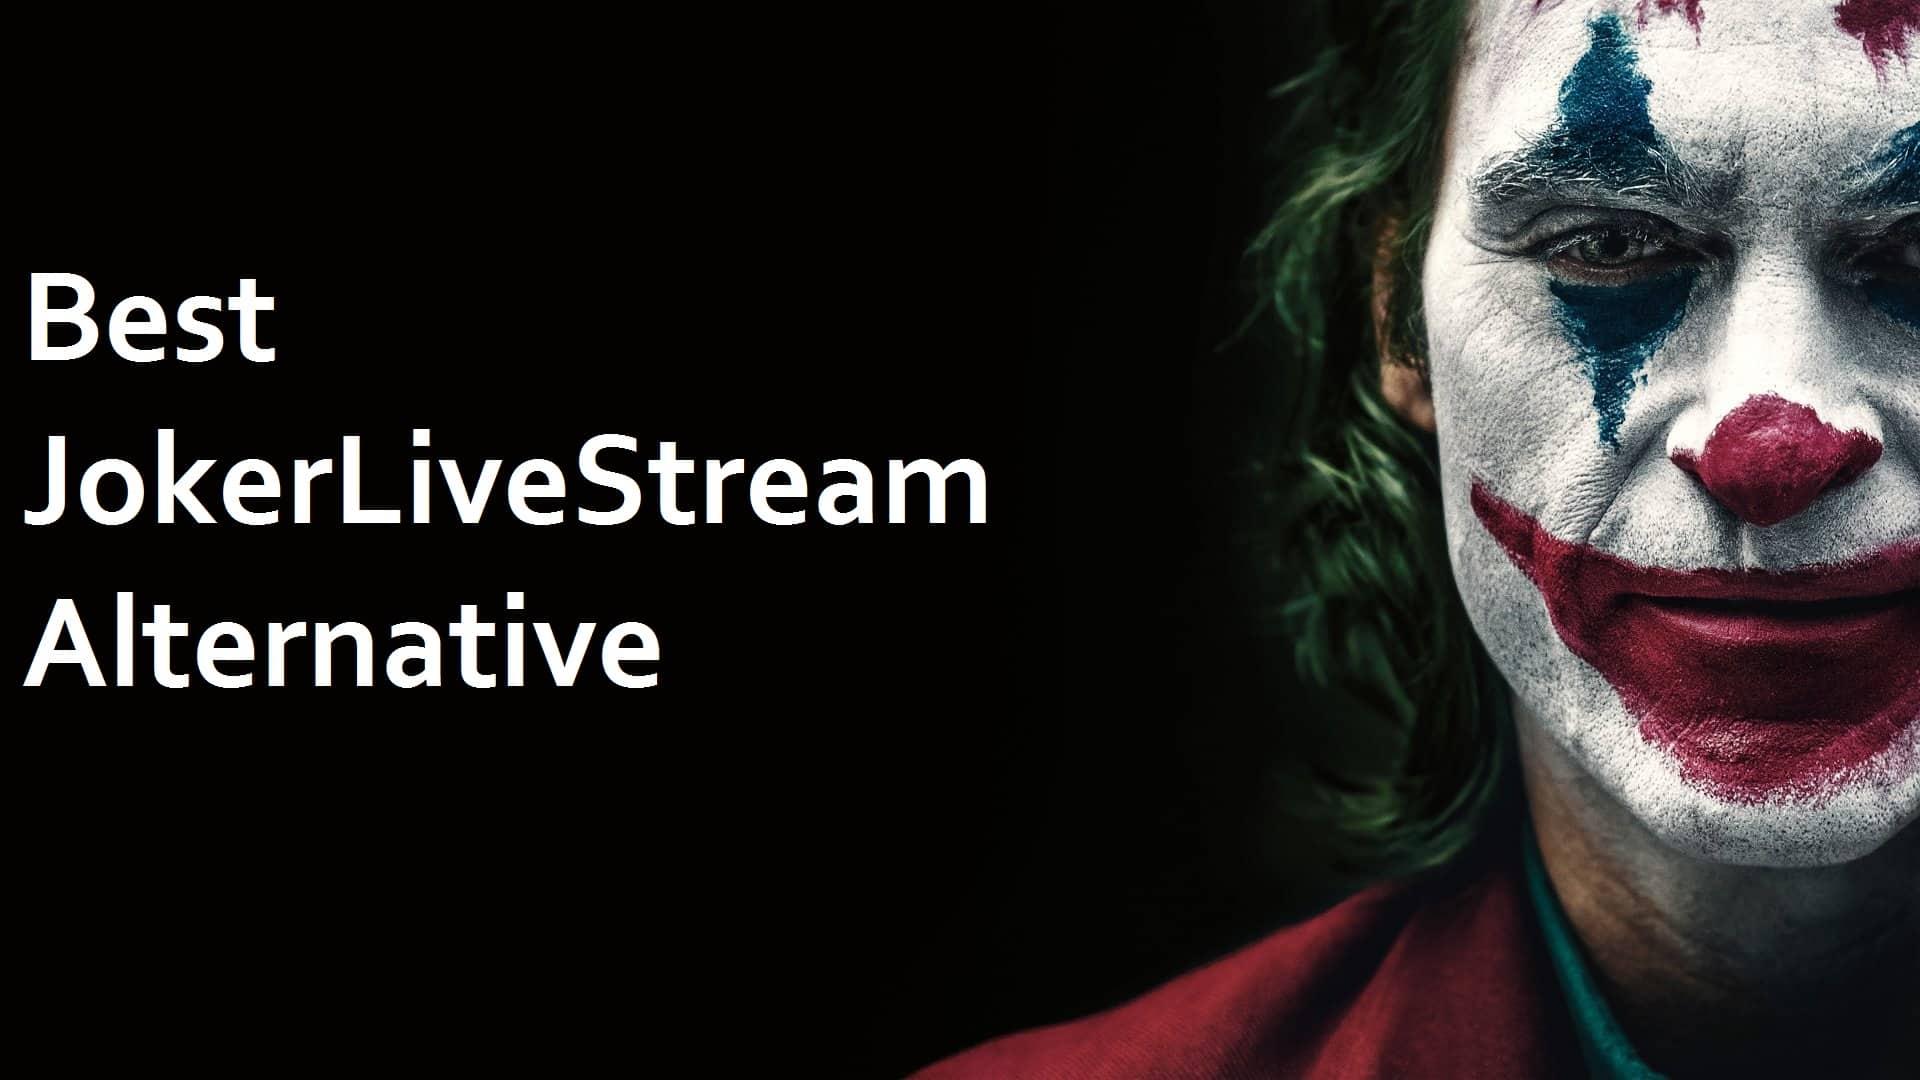 jokerlivestream-alternative-Watch-football-stream-online